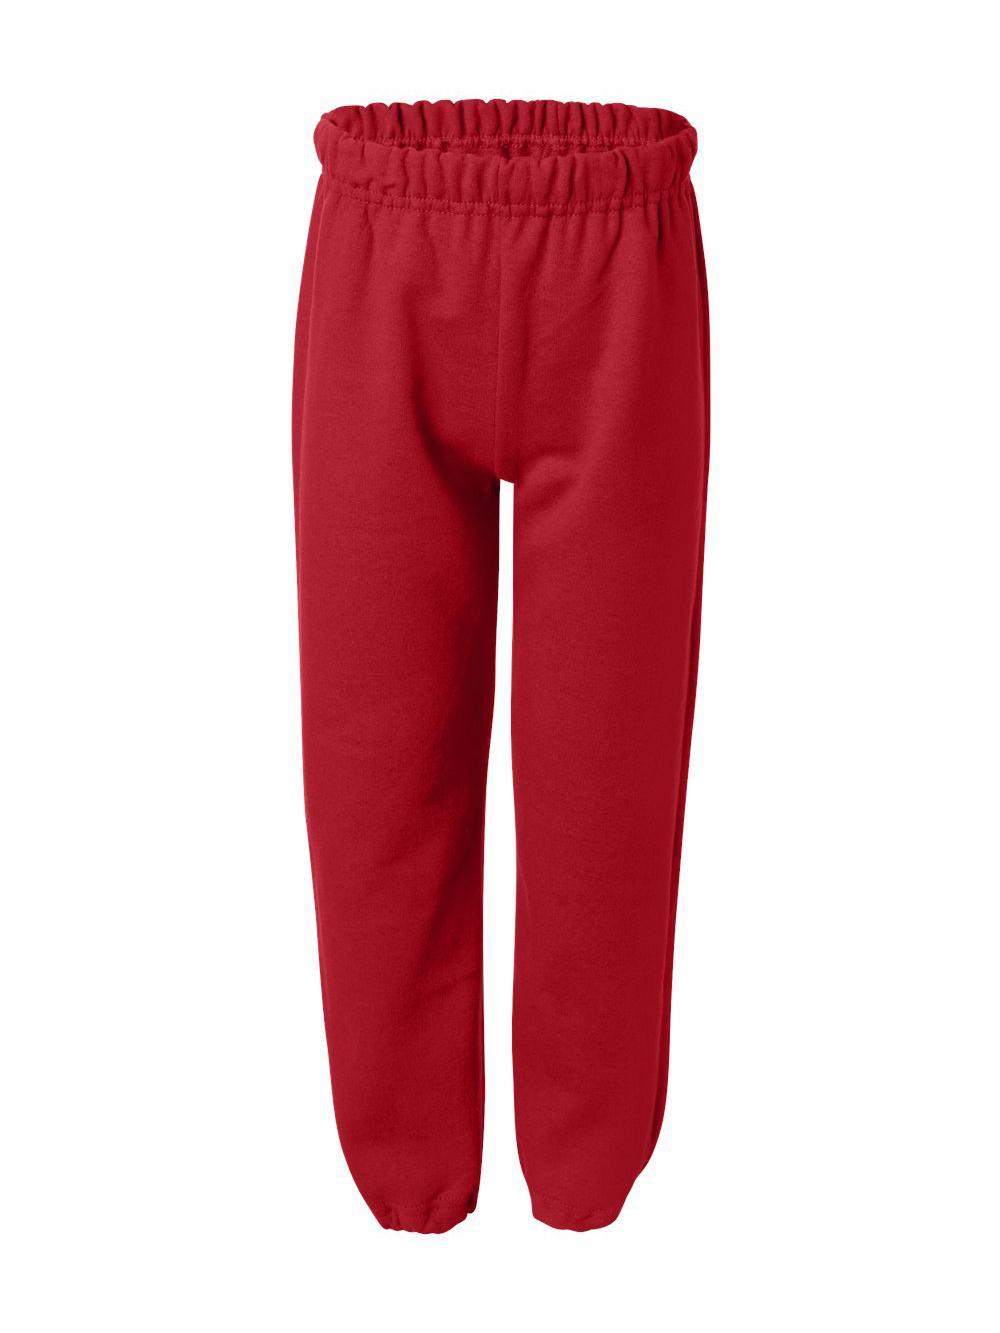 Gildan-Heavy-Blend-Youth-Sweatpants-18200B thumbnail 12